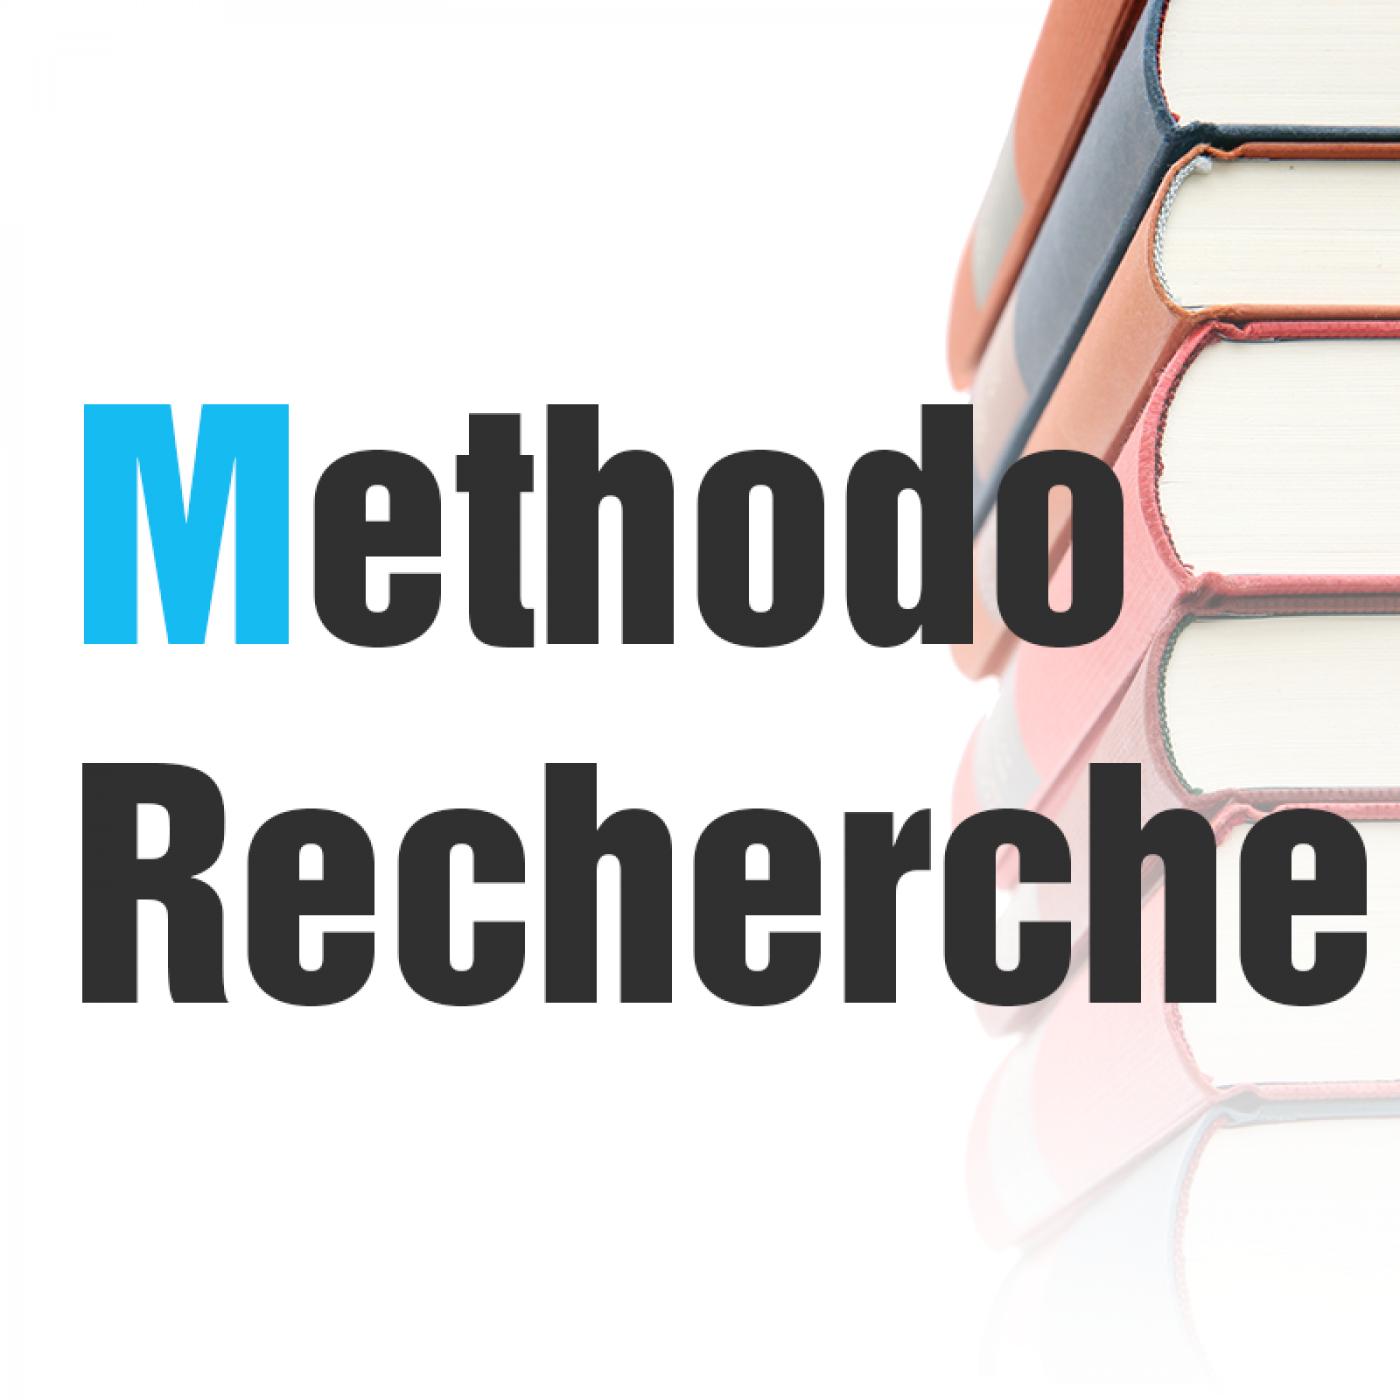 Methodo Recherche